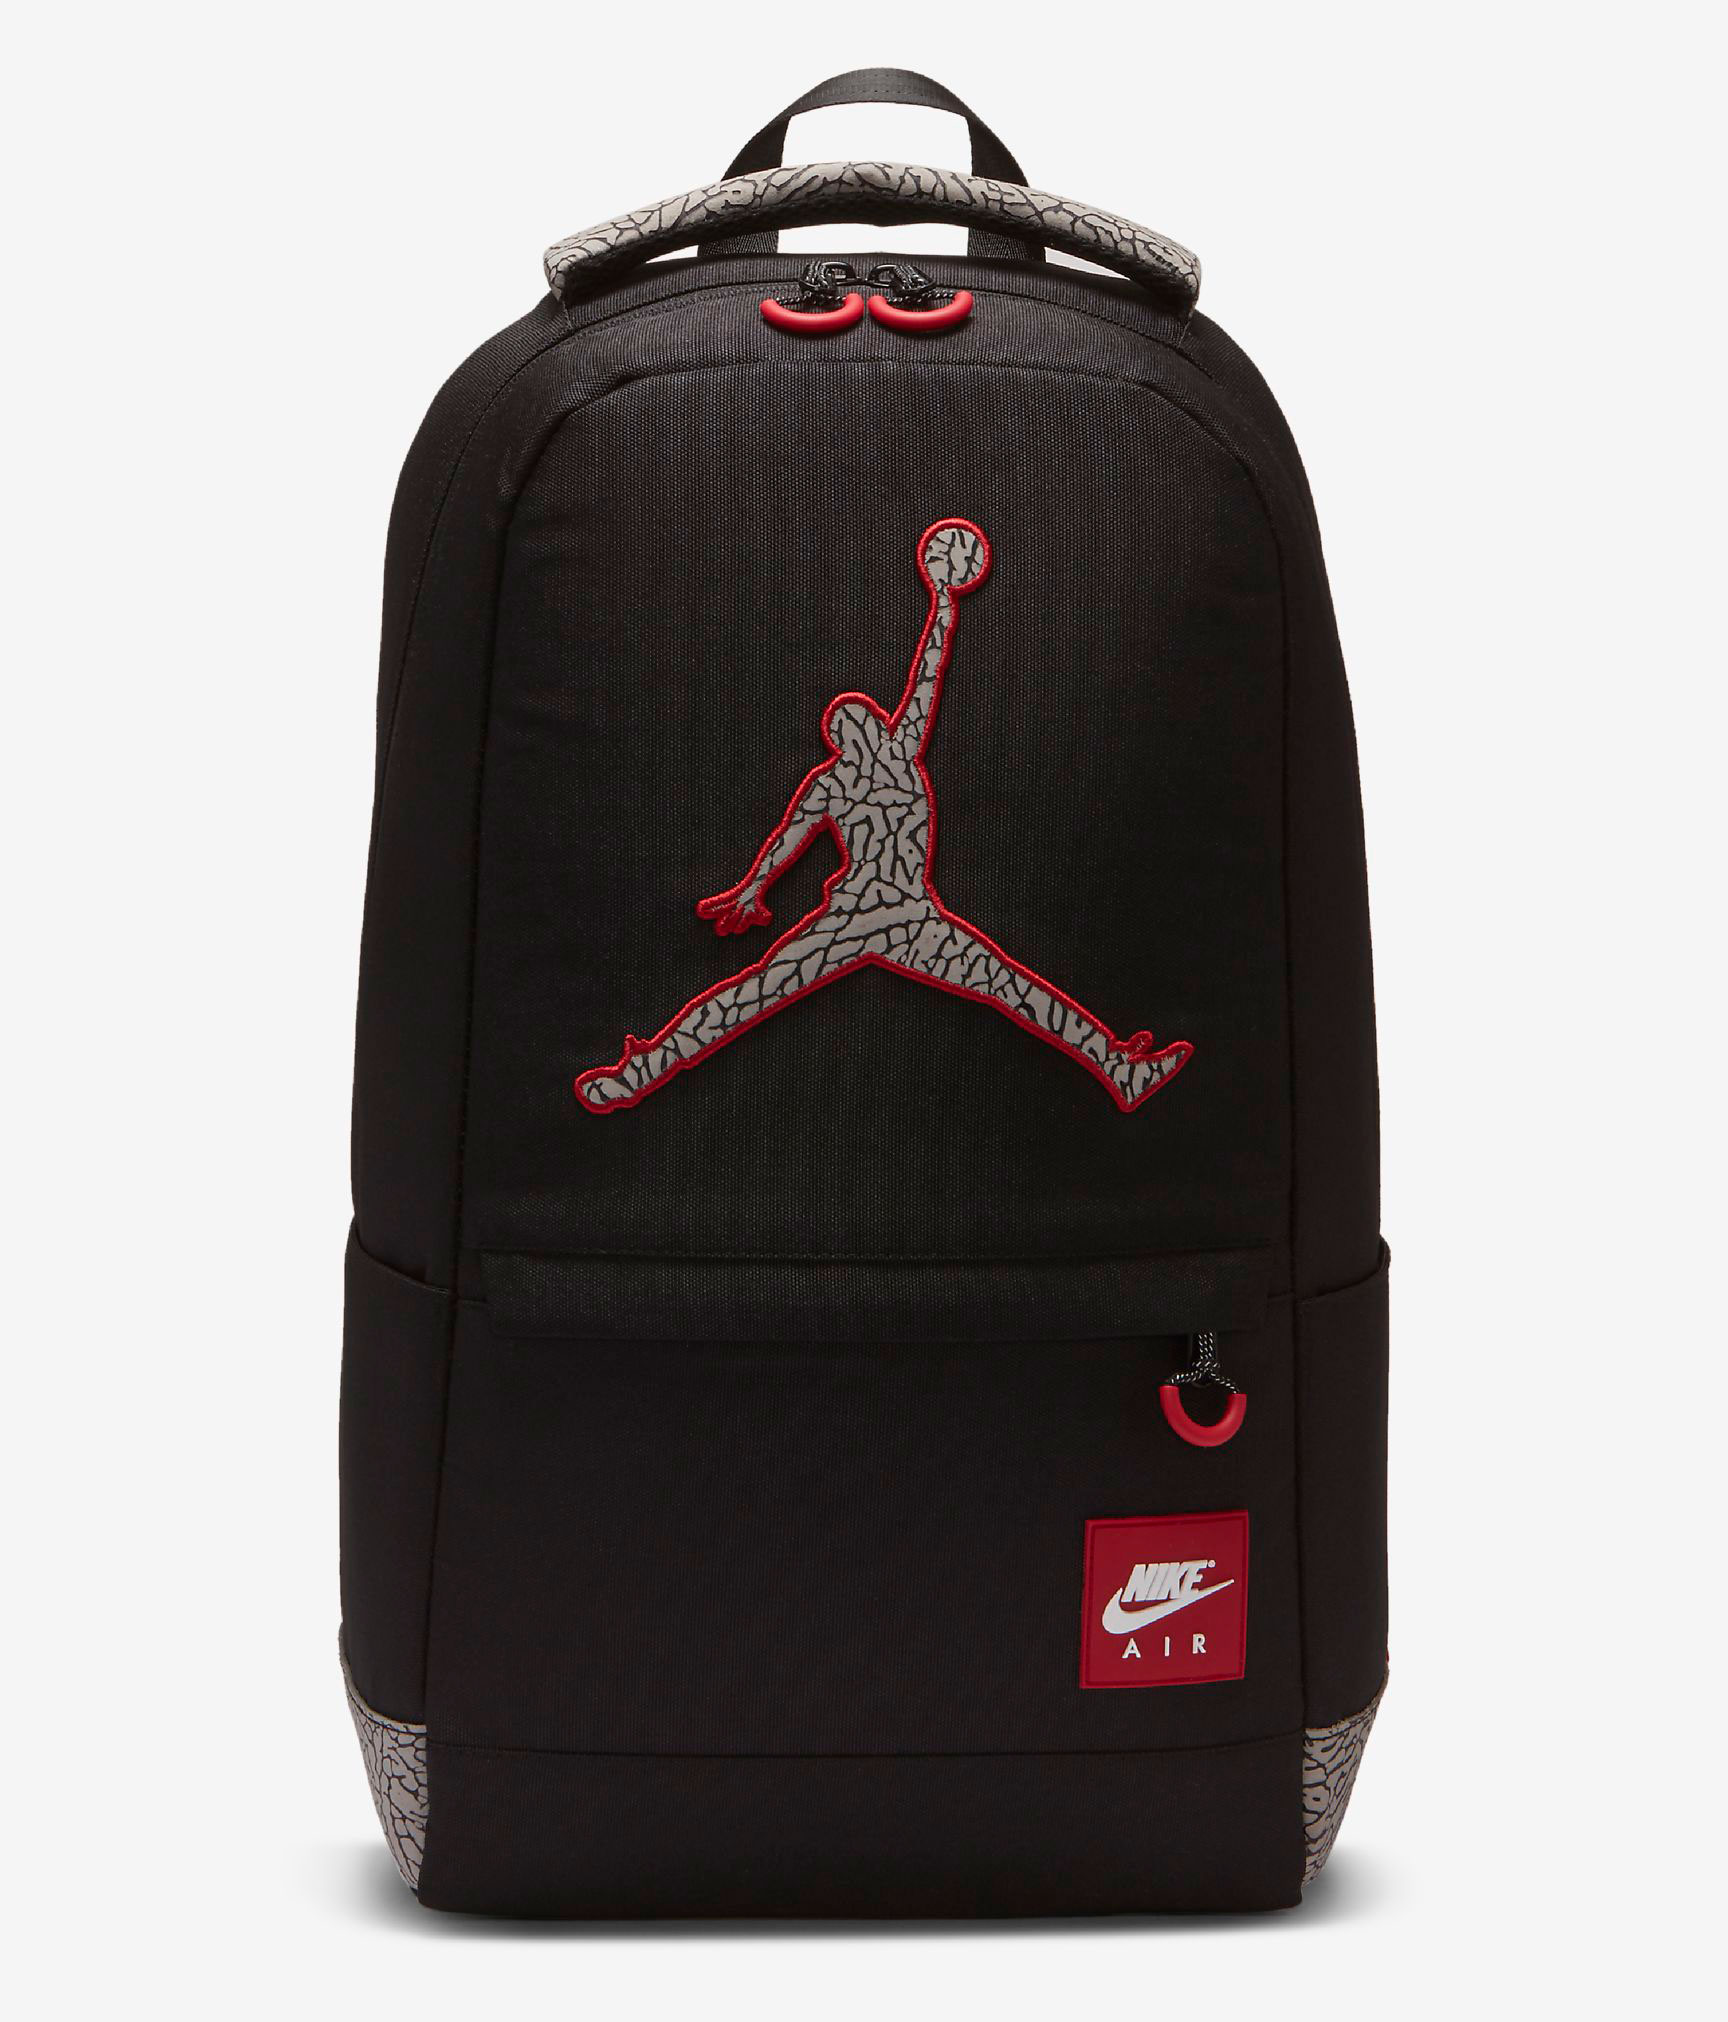 jordan-3-denim-fire-red-backpack-1